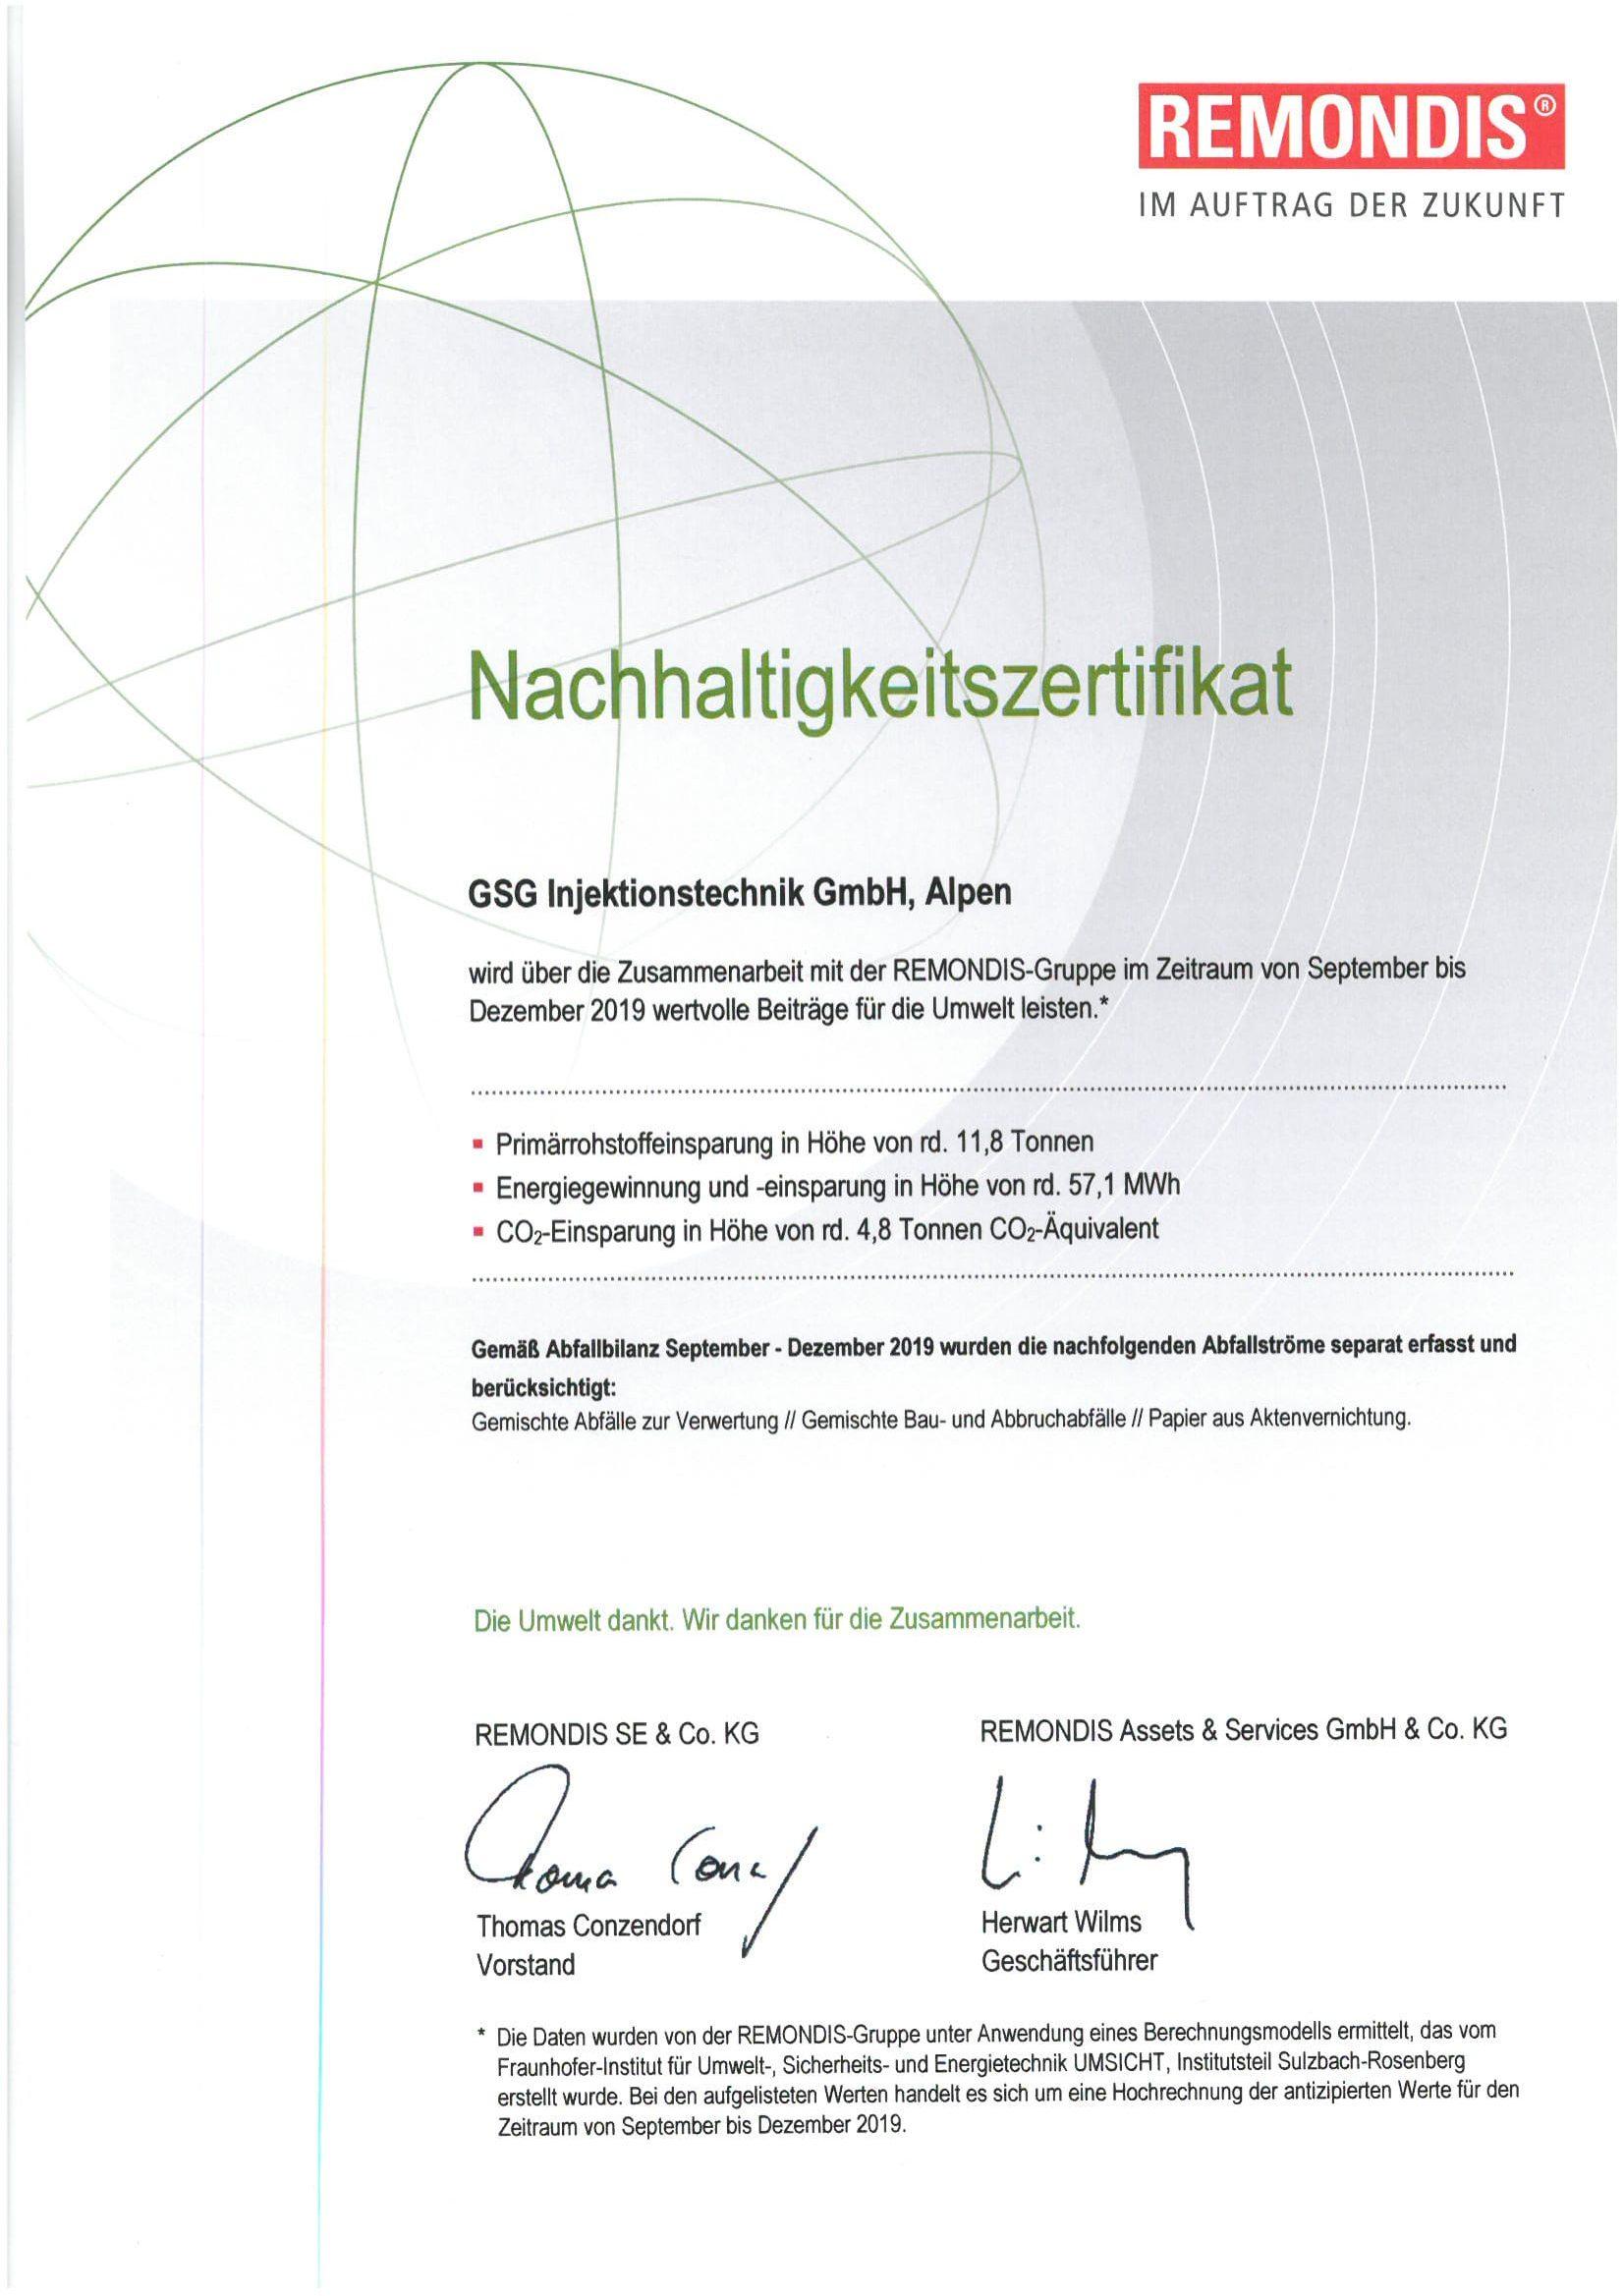 Zertifikat-2-e1569844068777-2.jpg